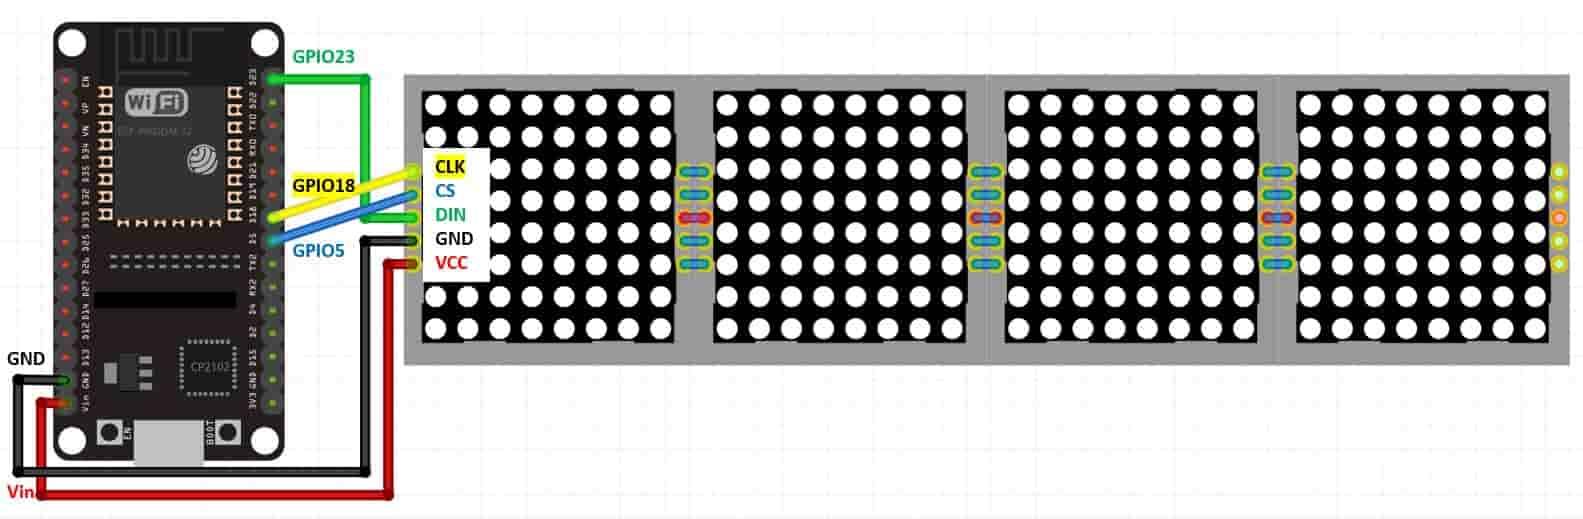 esp32 interfacing with max7219 led dot matrix display